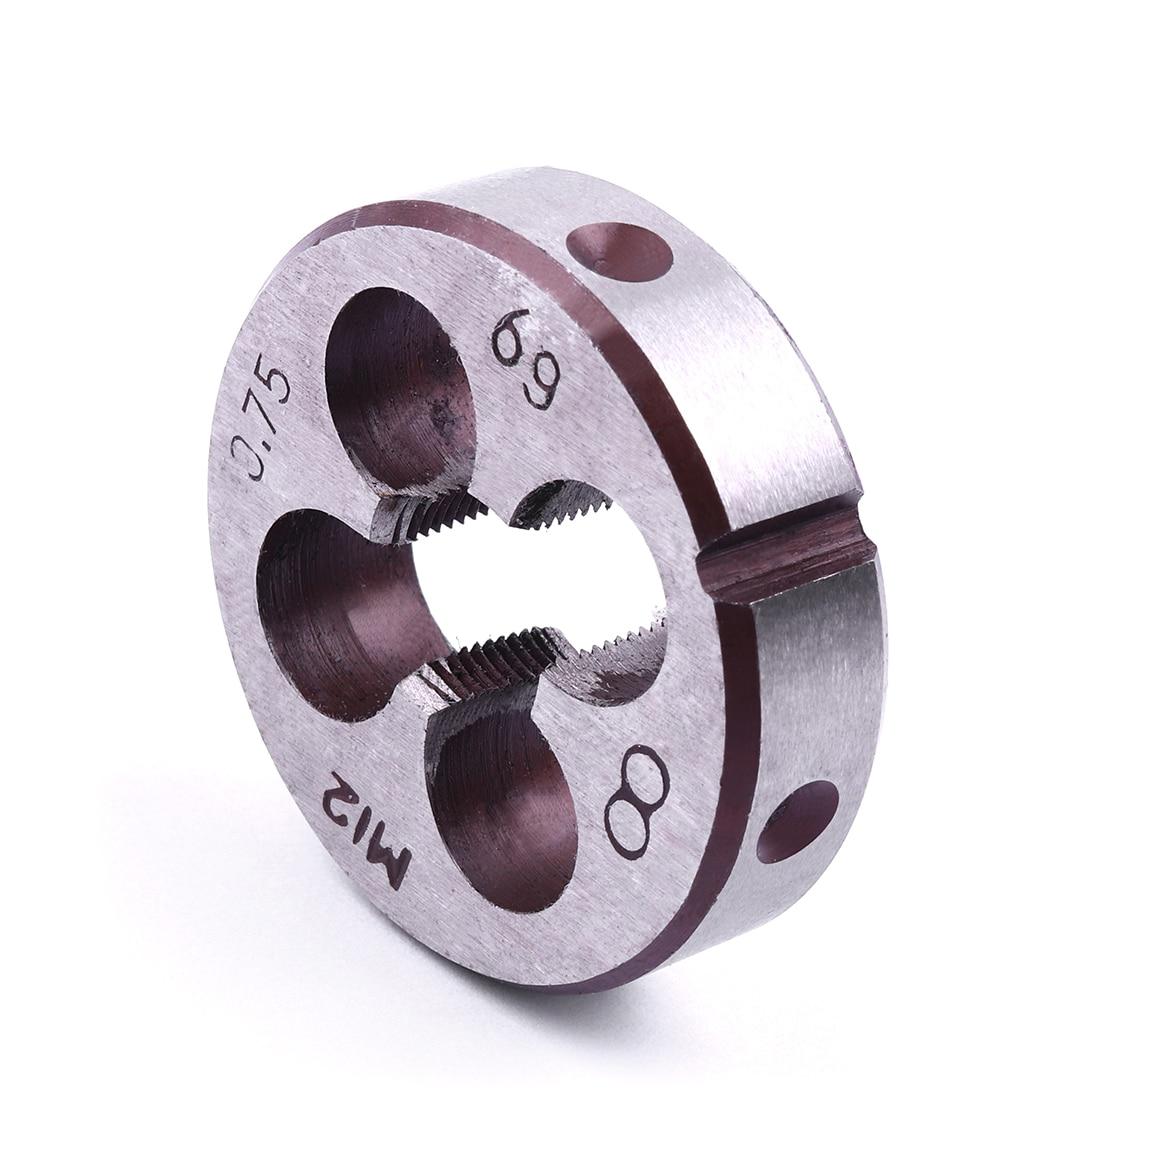 HSS Metric Thread Die M8*1mm 8mm x1.0mm Dies Threading Tools for Mold Machining